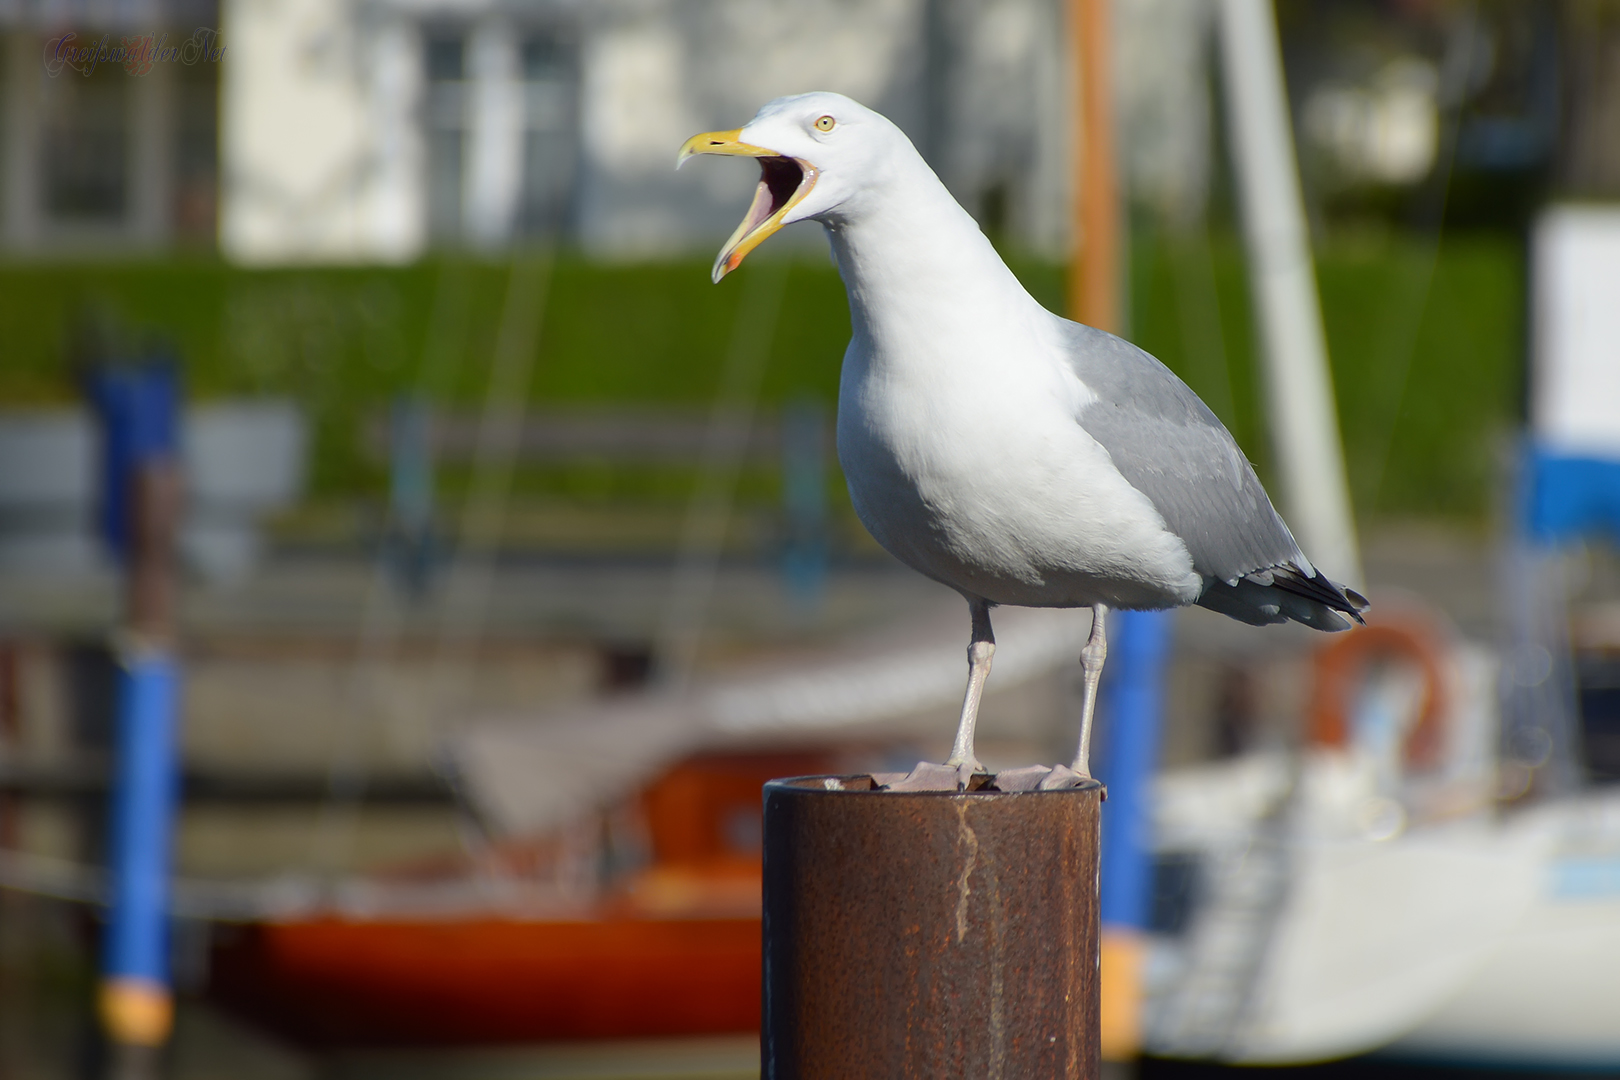 Krach machen - Möwe am Ryck in Greifswald-Wieck